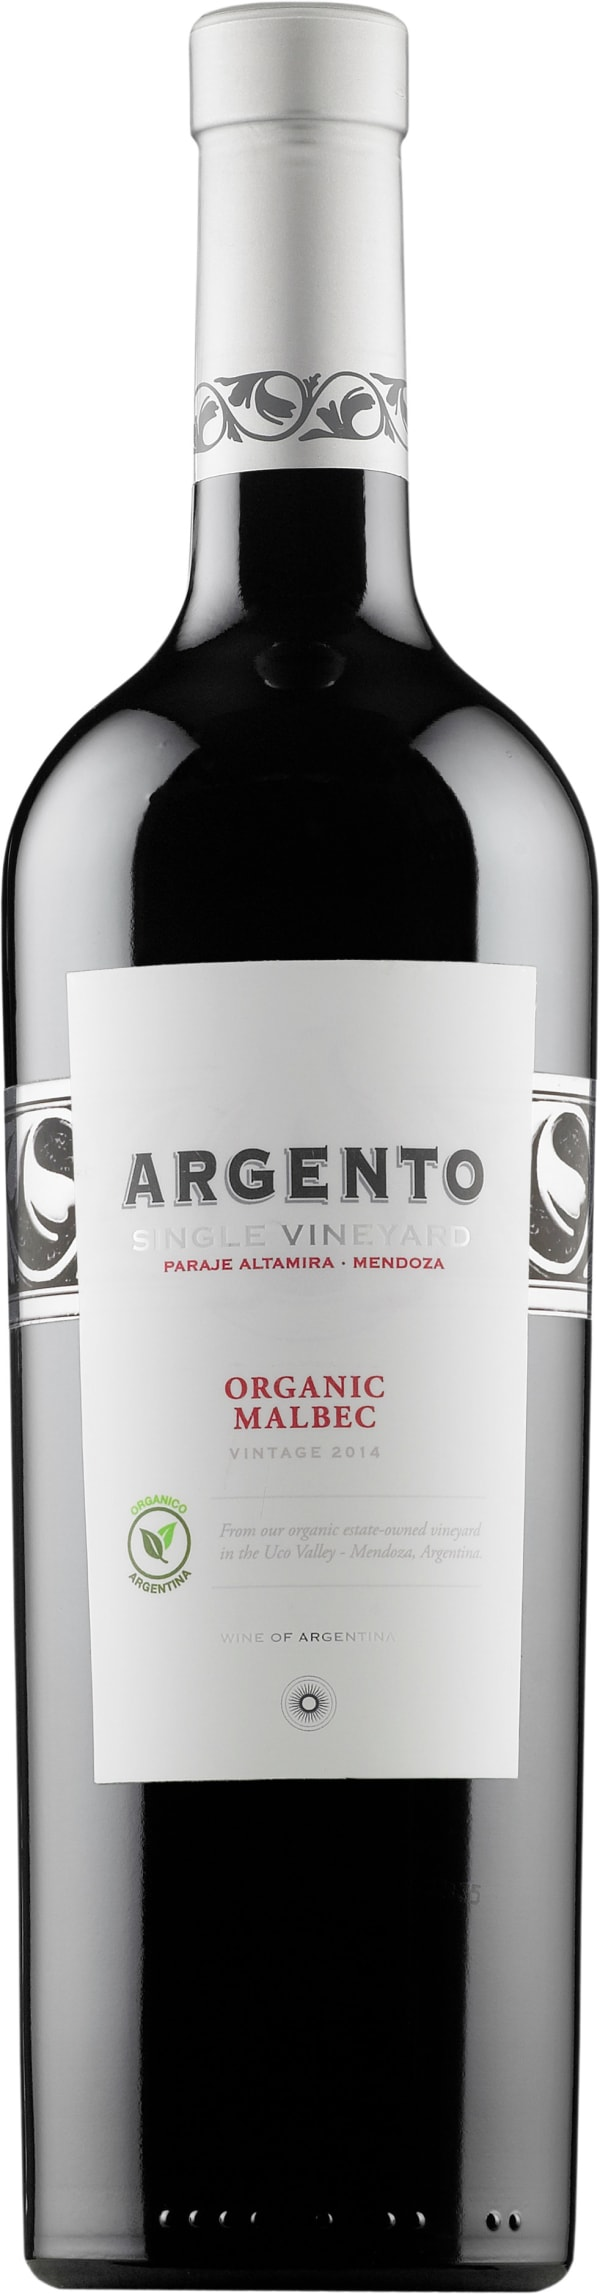 Argento Paraje Altamira Organic Malbec 2014